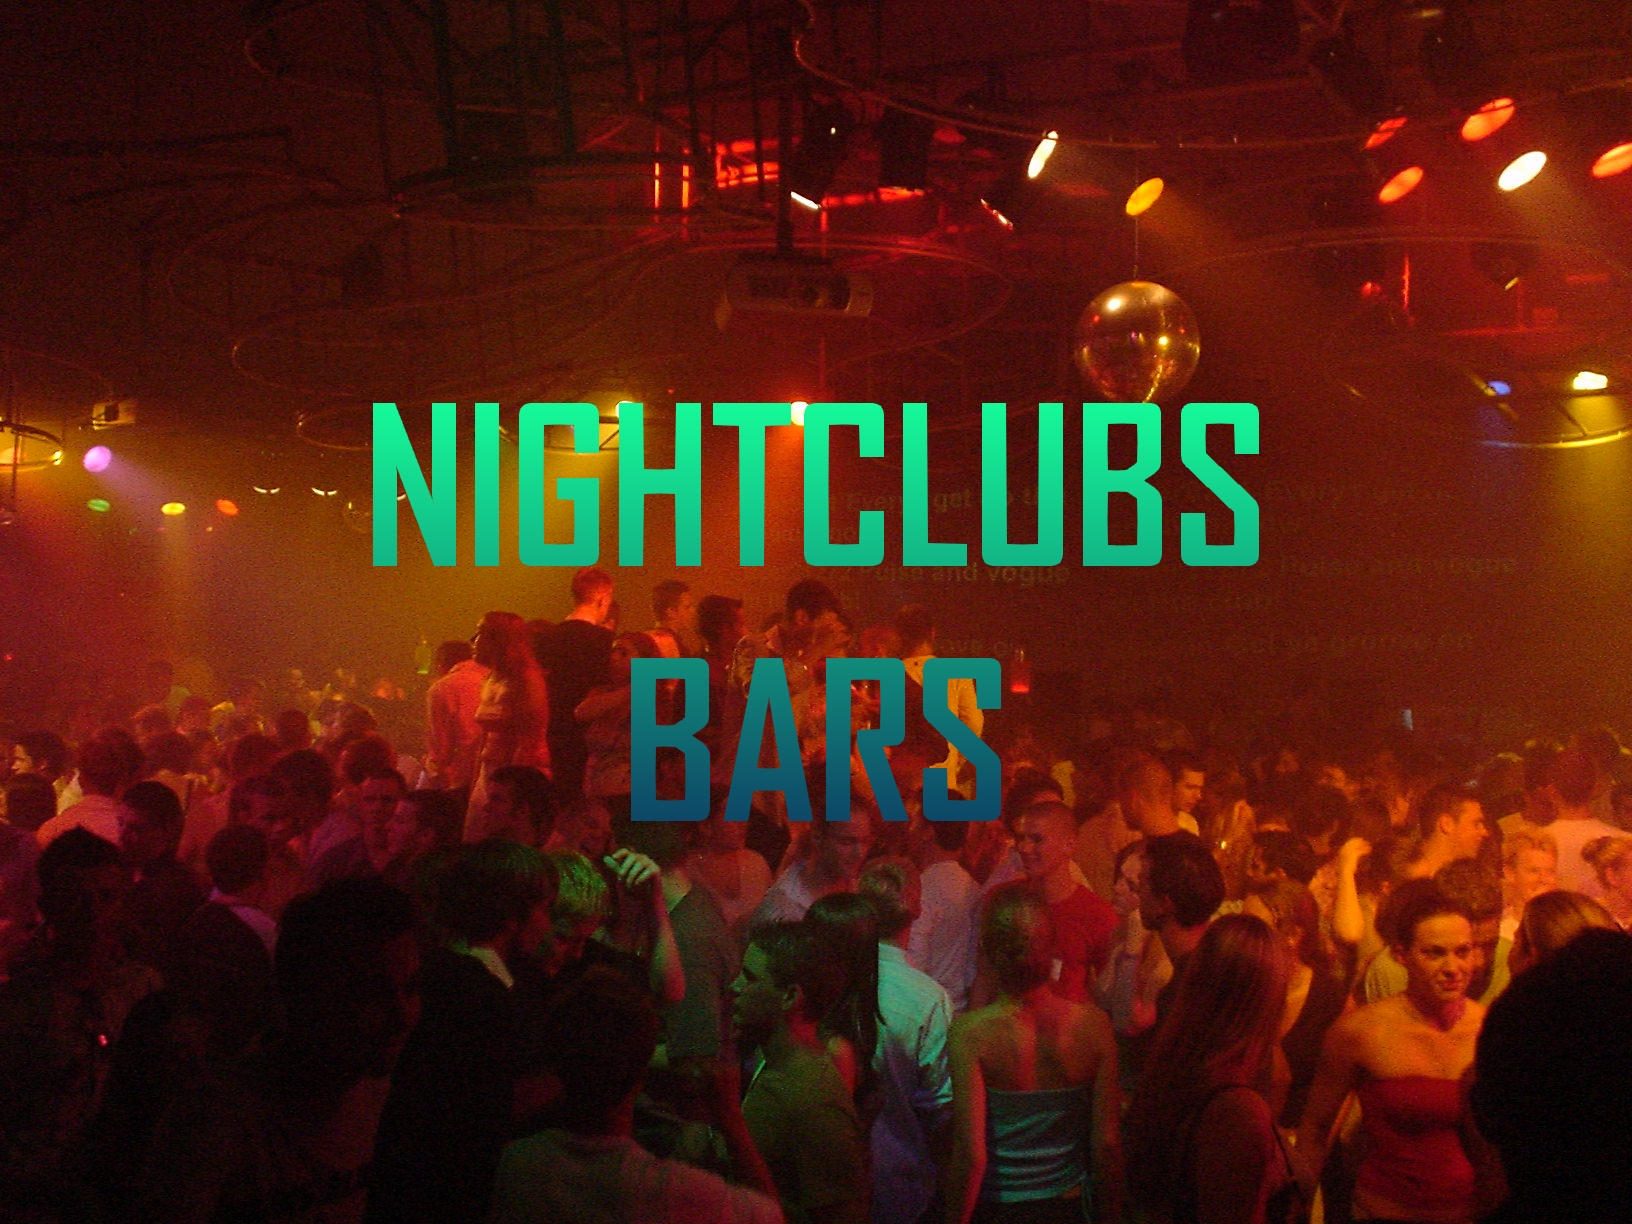 nightclubs bars 1.jpg